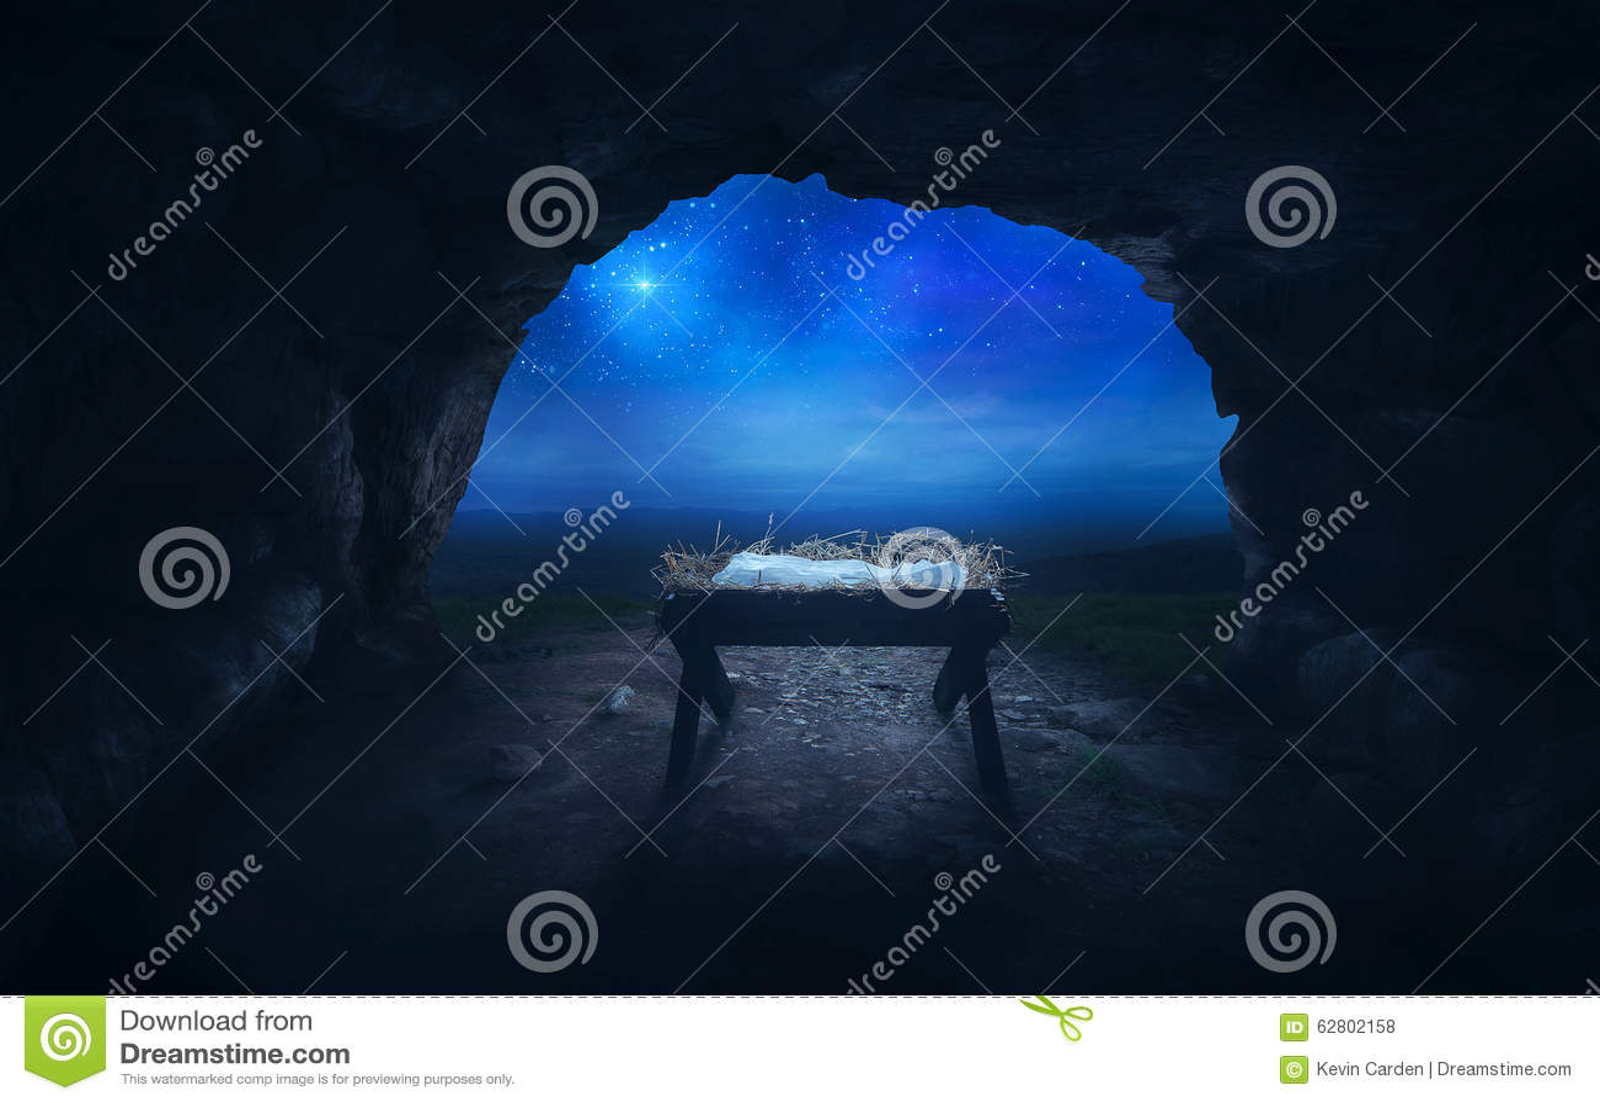 Comedoiro na caverna